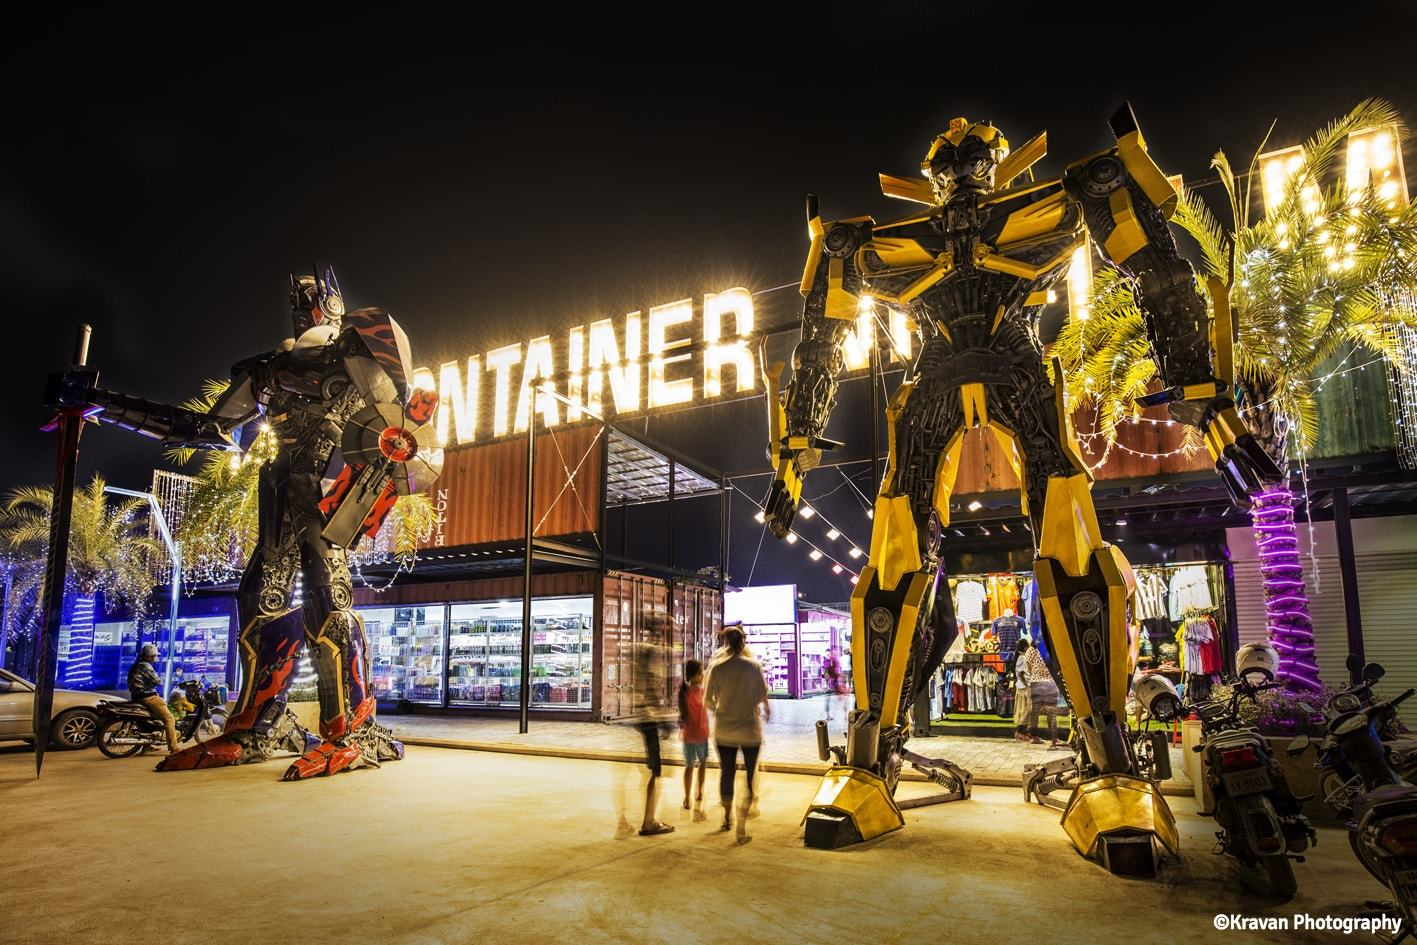 A new tourist hotspot? Container night markets open.